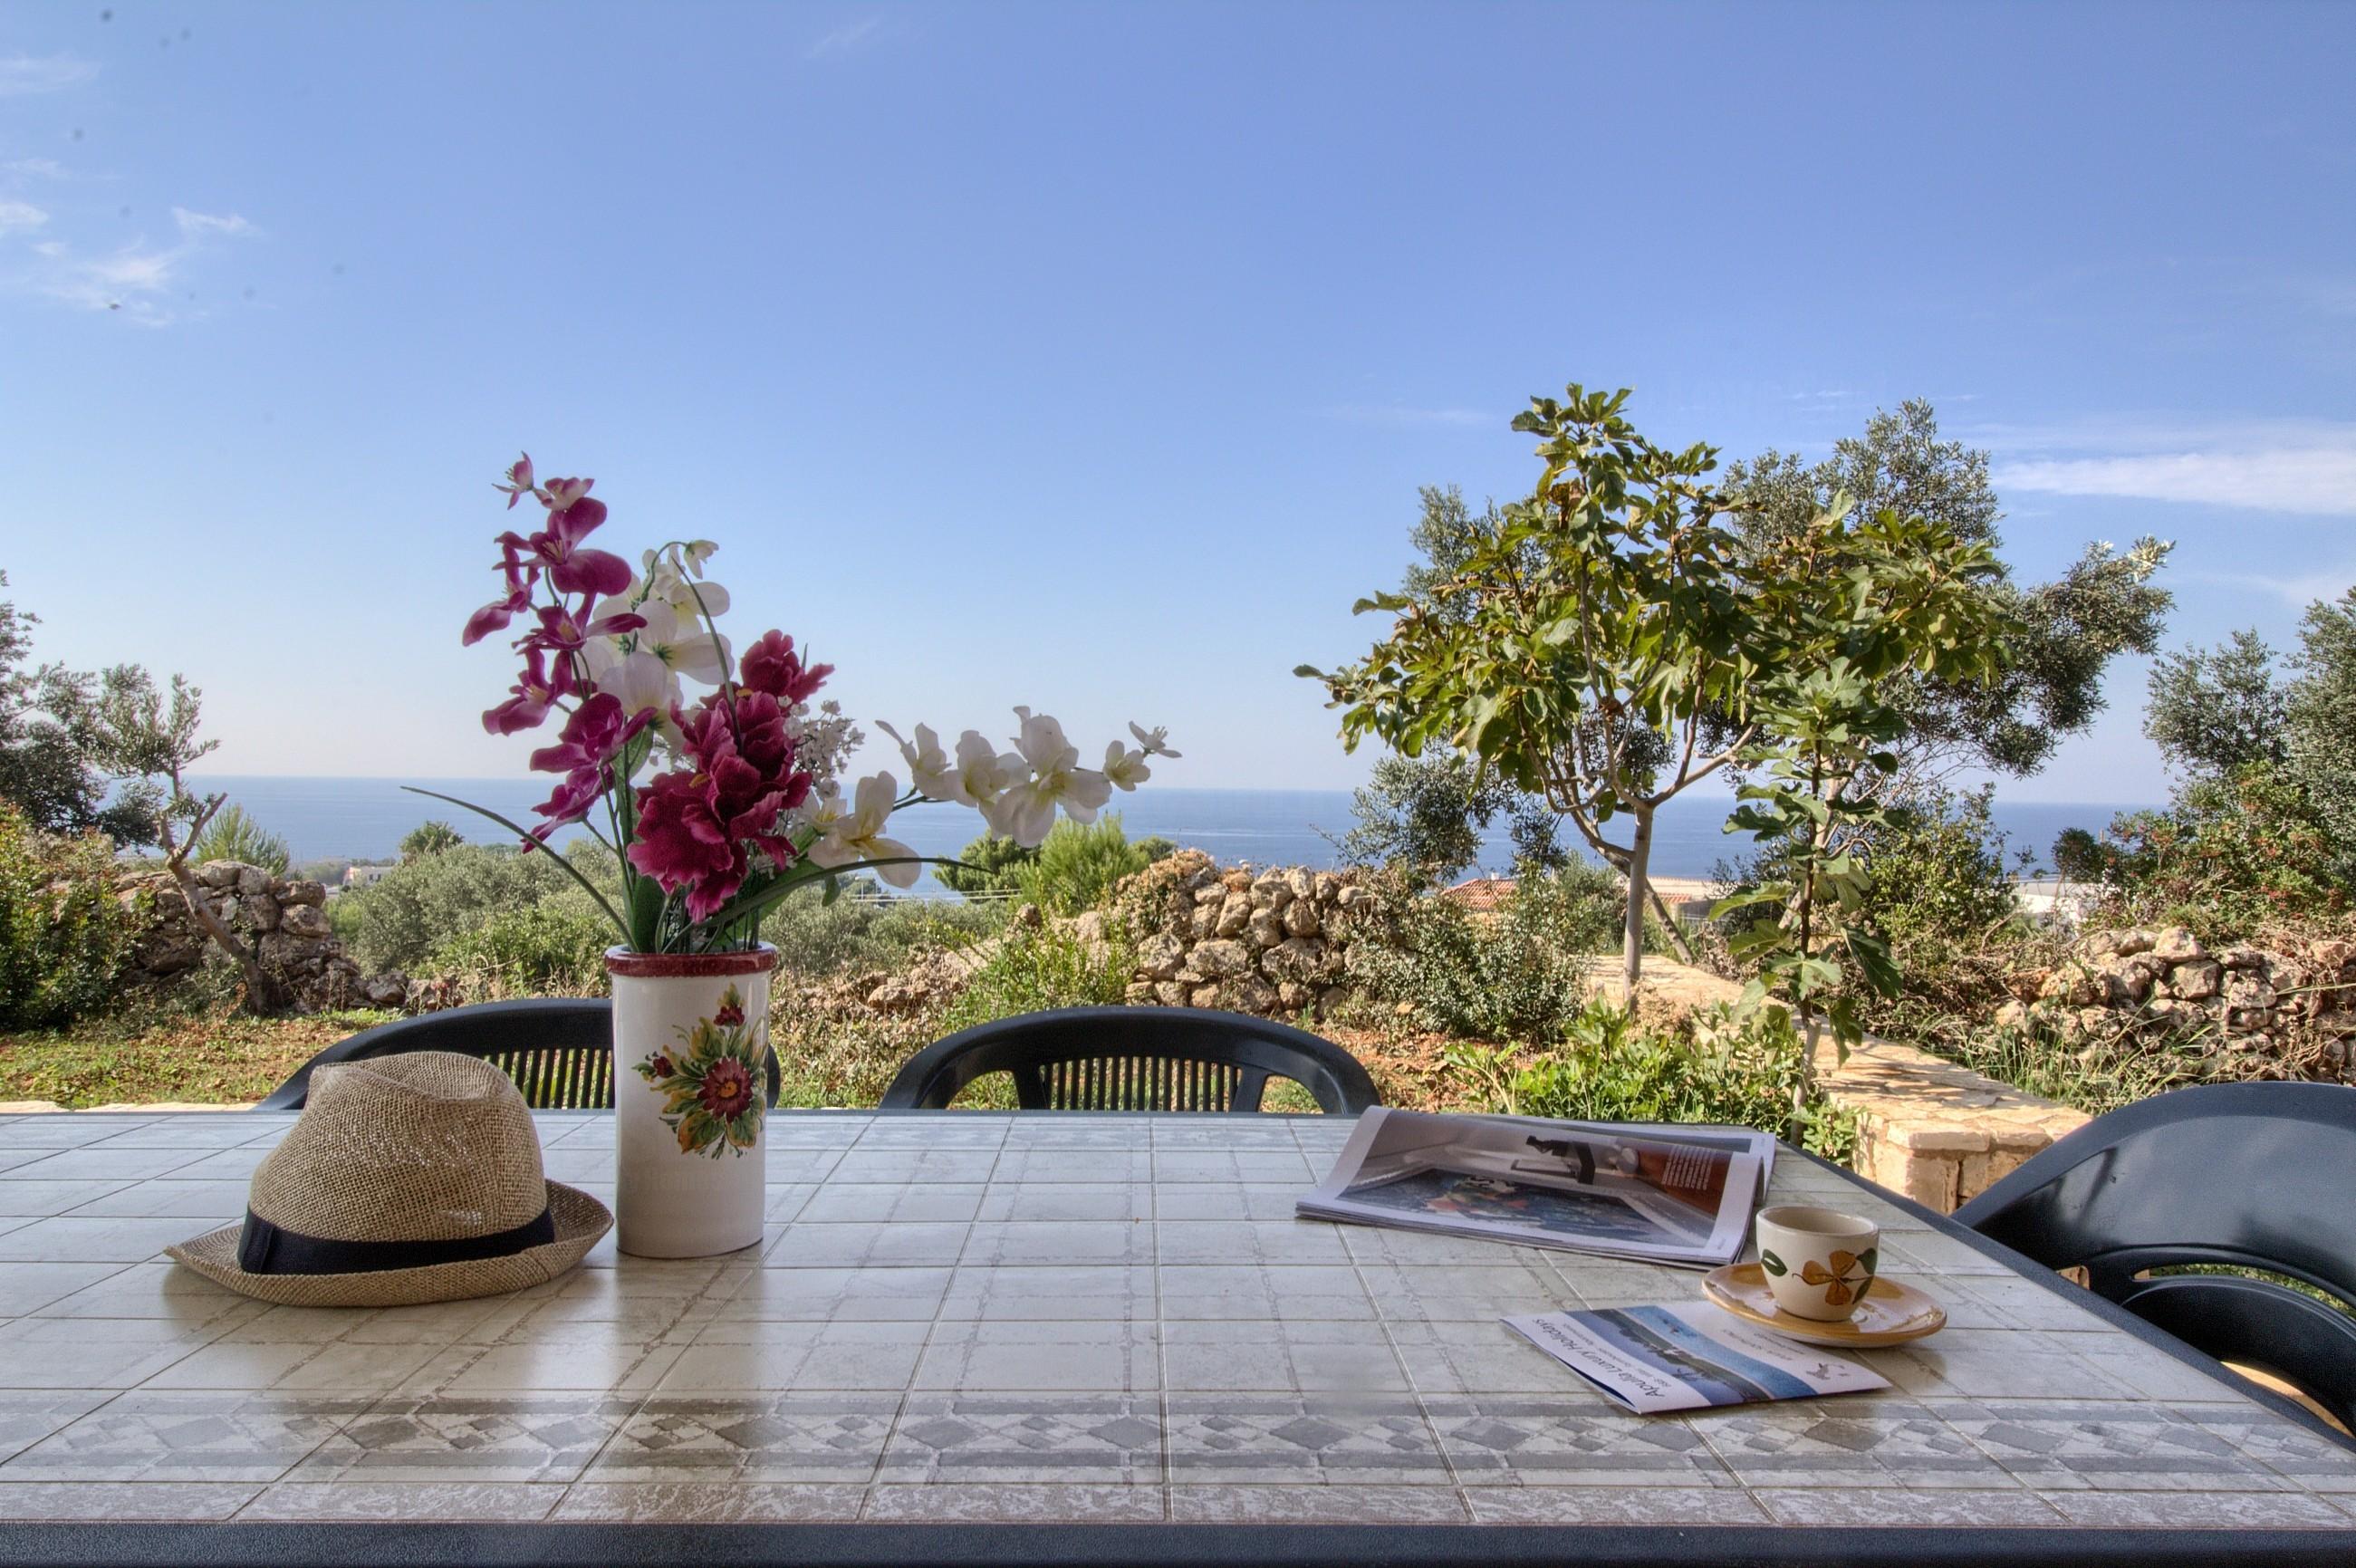 Apartment Pino amazing seaview photo 23472018